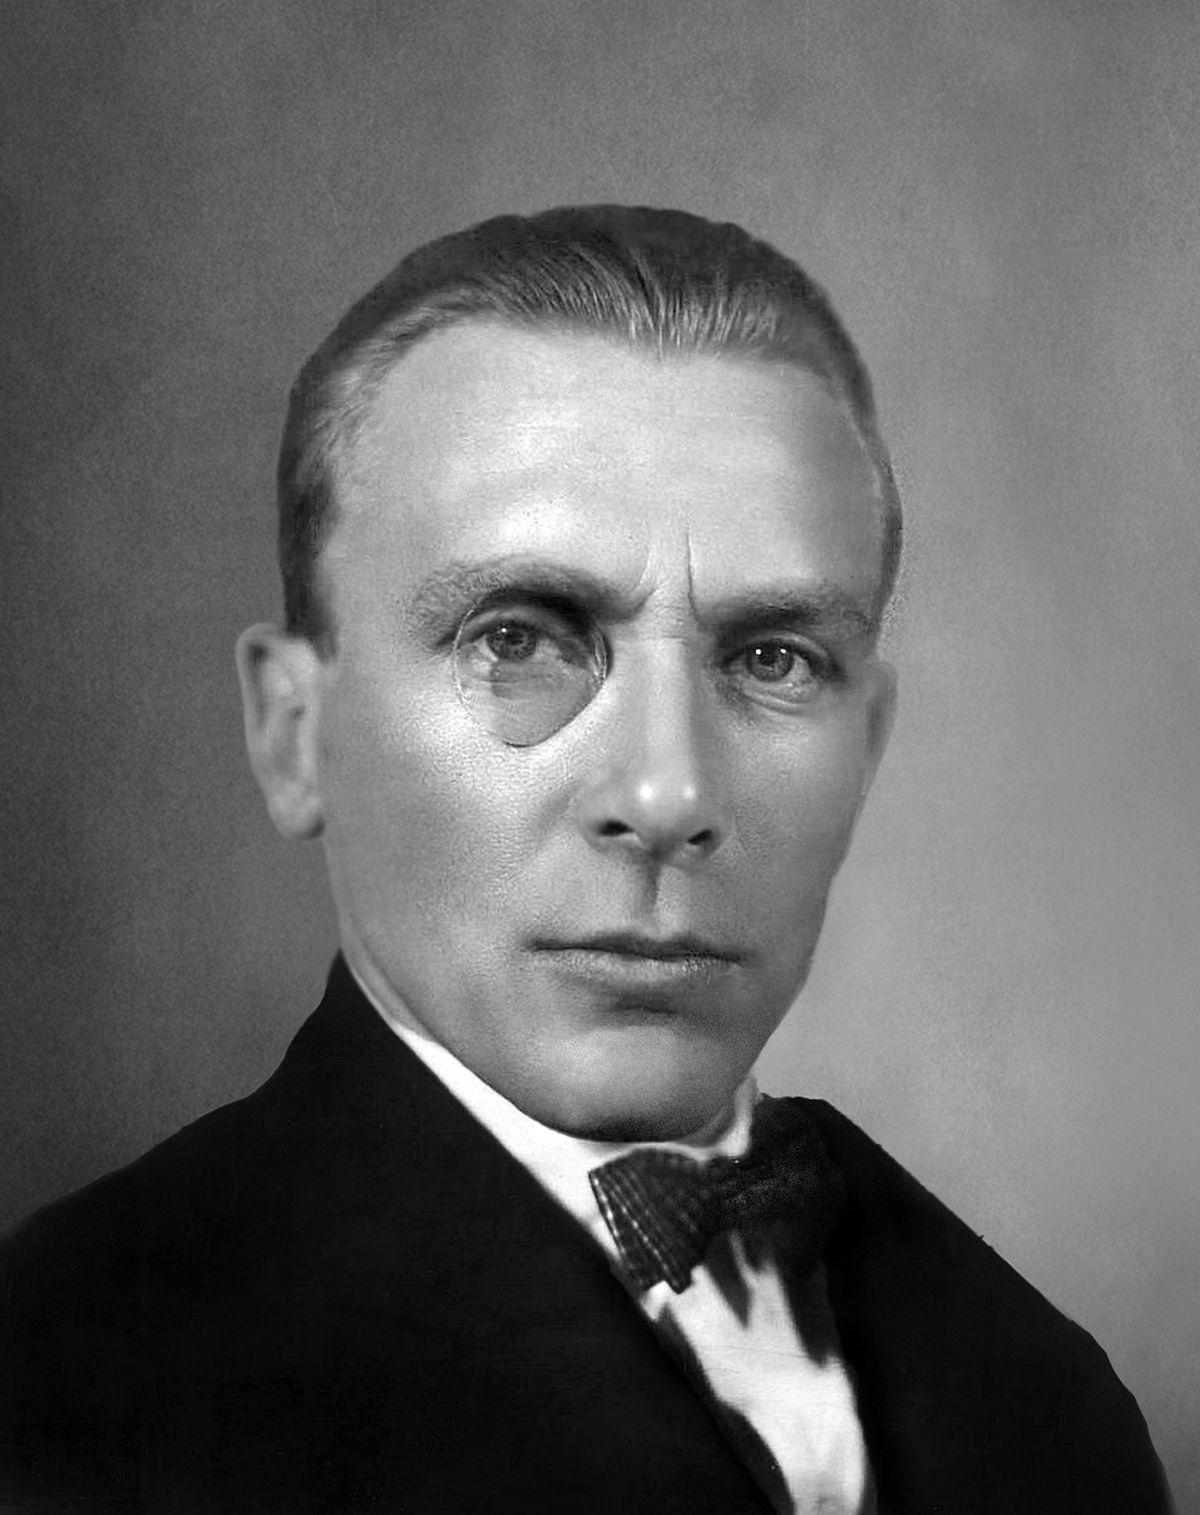 mikhail-bulgakov-mikhail-bulgakov-2